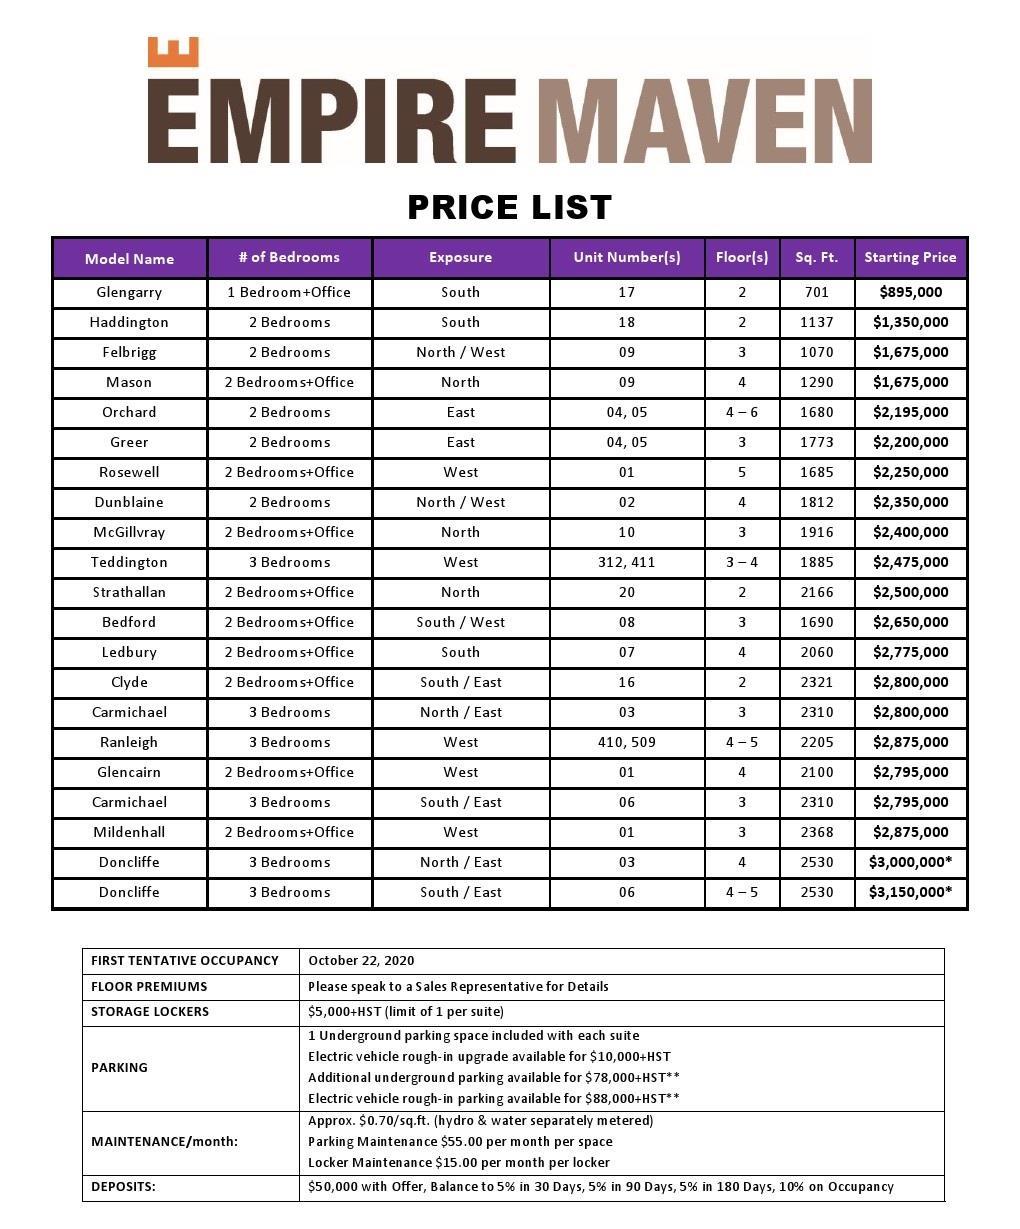 Empire Maven Condos - Maziar Moini Broker Home Leader Realty